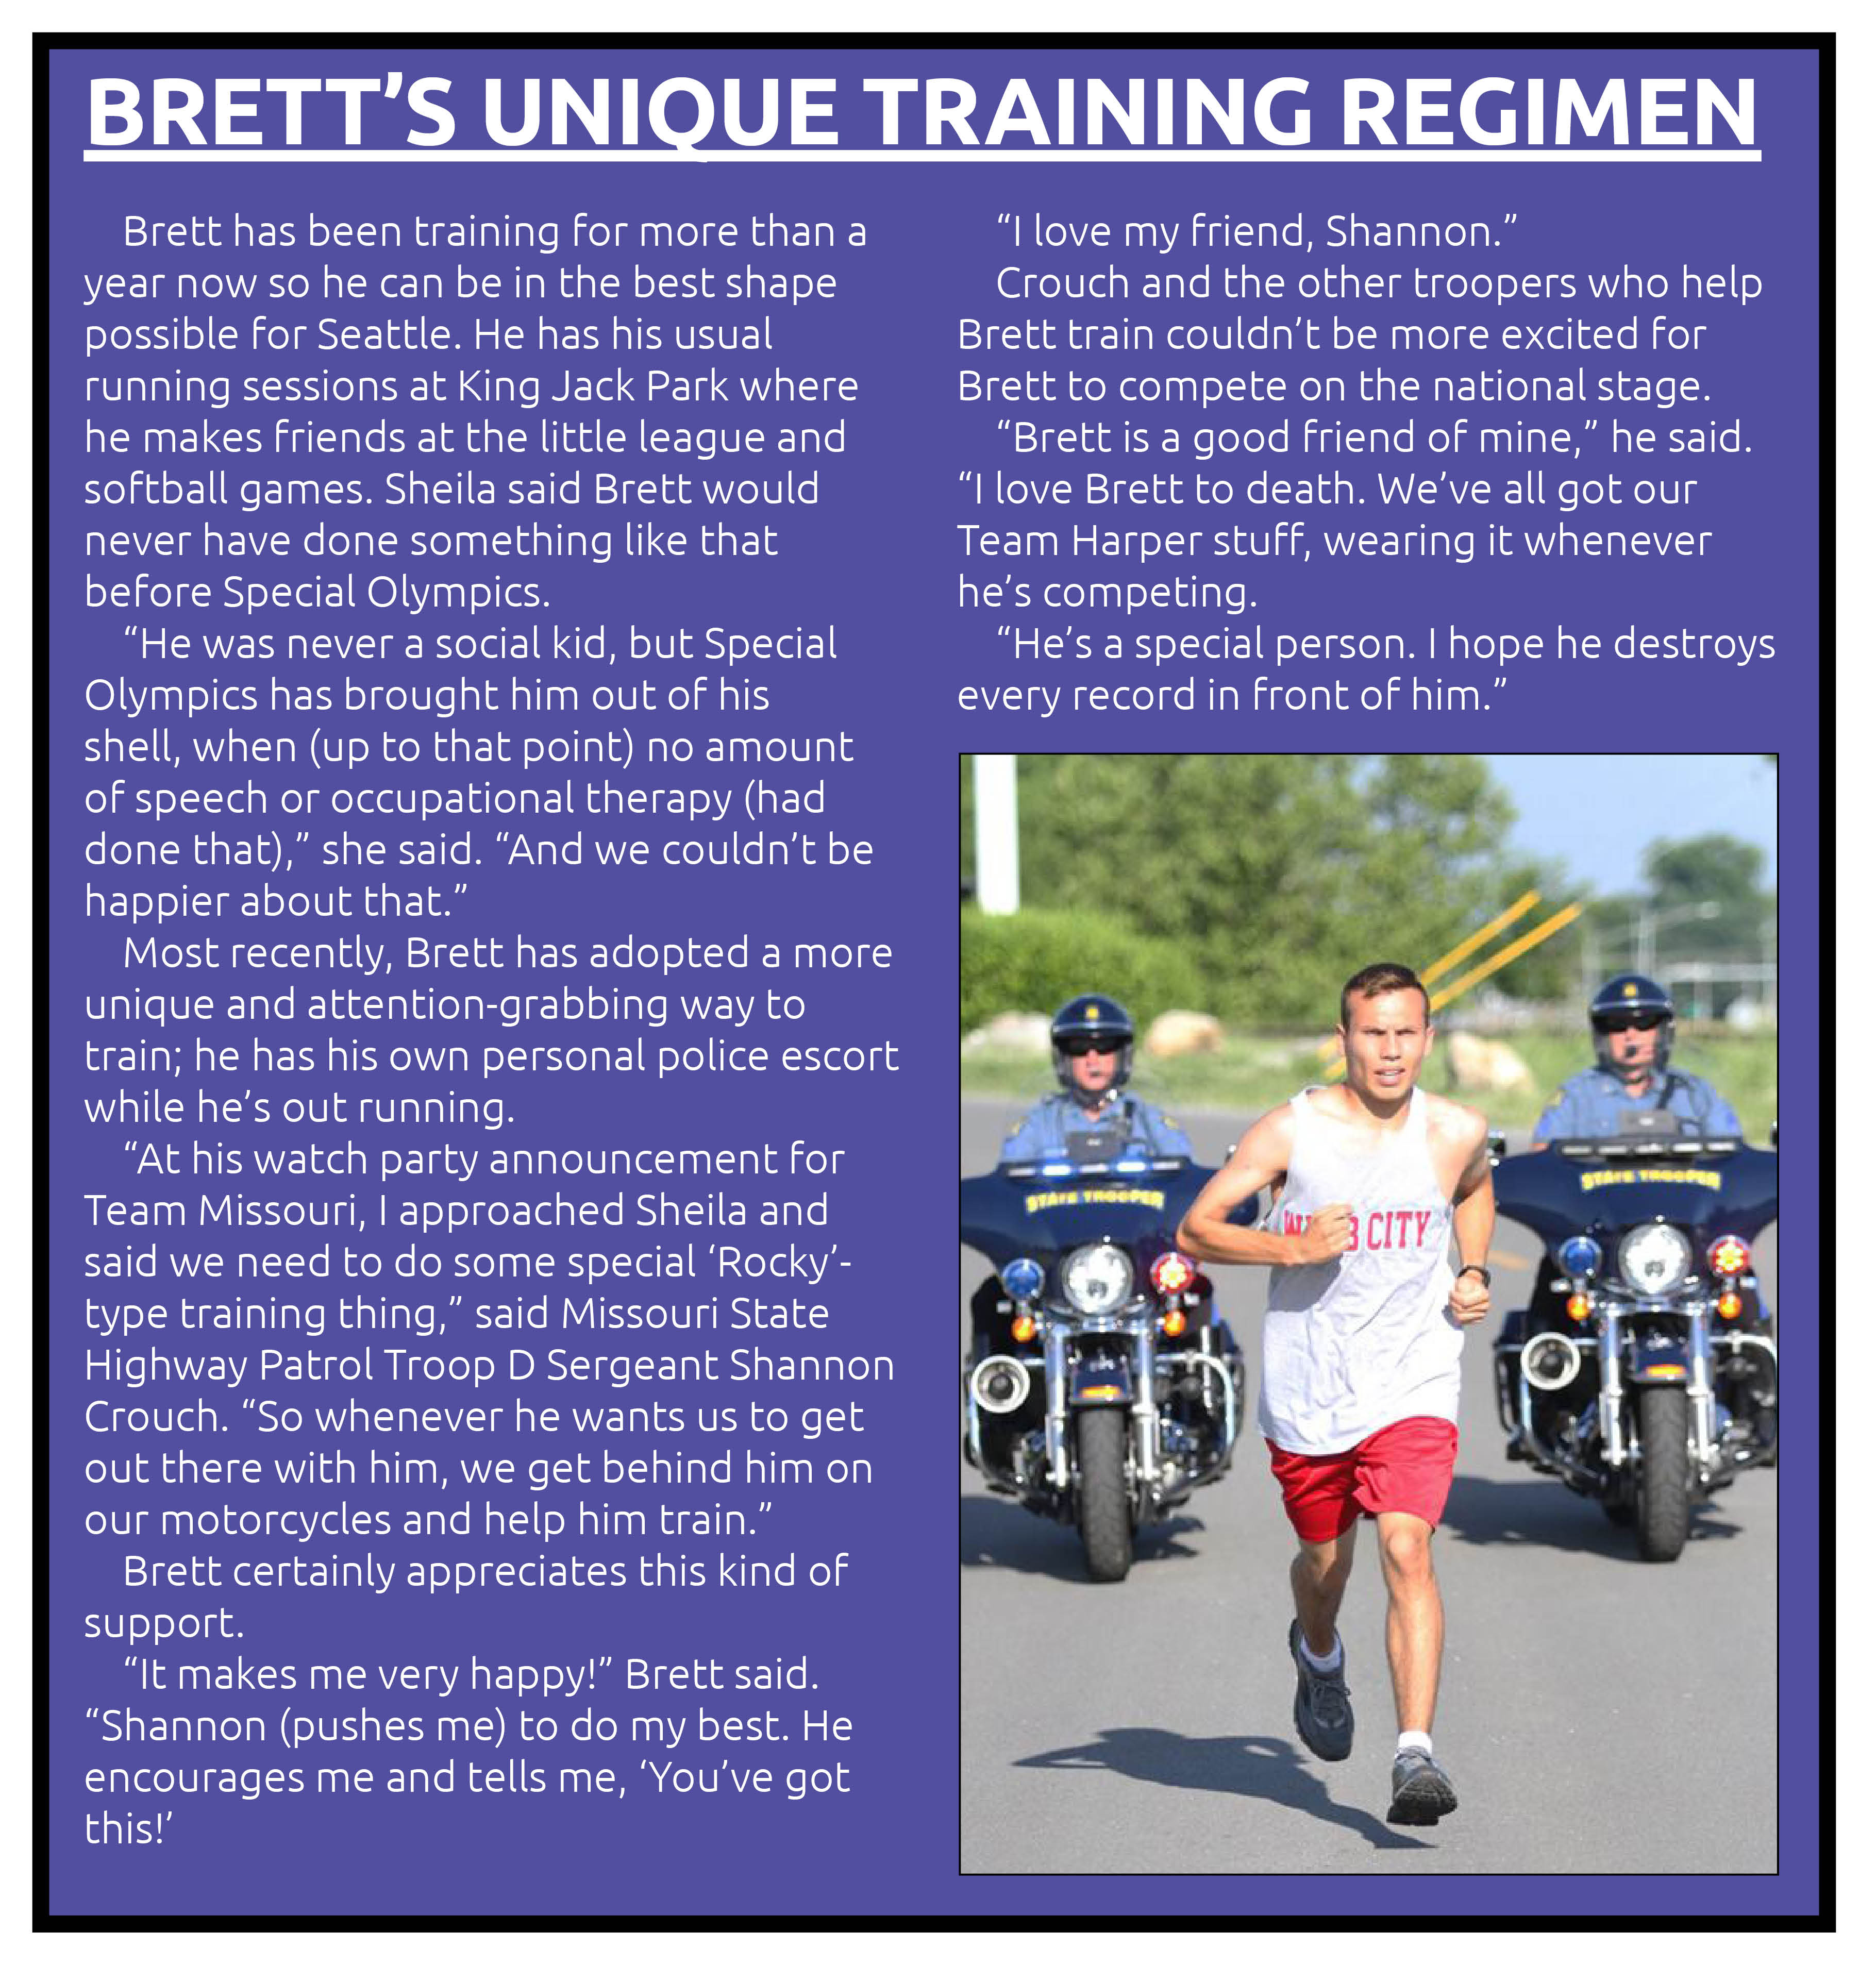 Brett's training pullout story